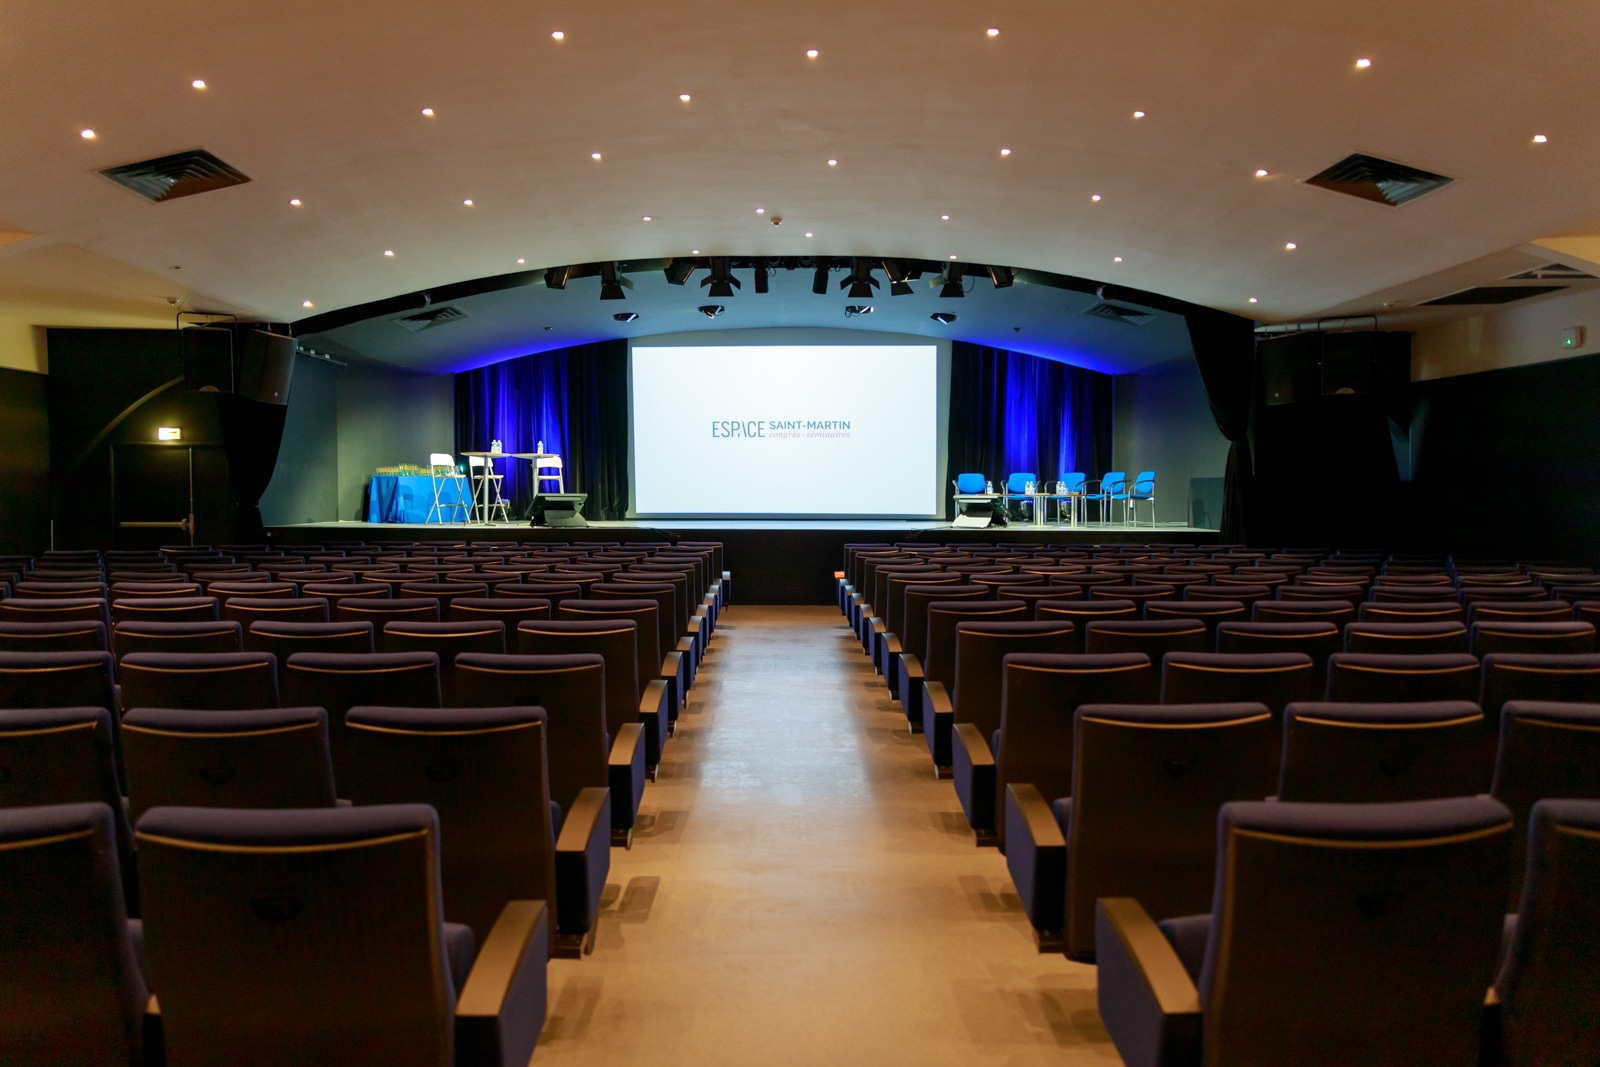 Auditorium, salle de spectacle à Paris